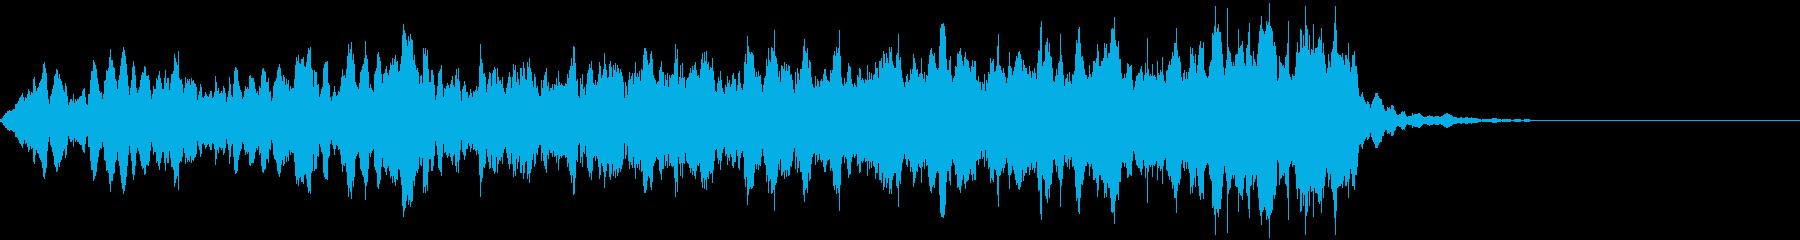 CINEMATIC RISER_18の再生済みの波形